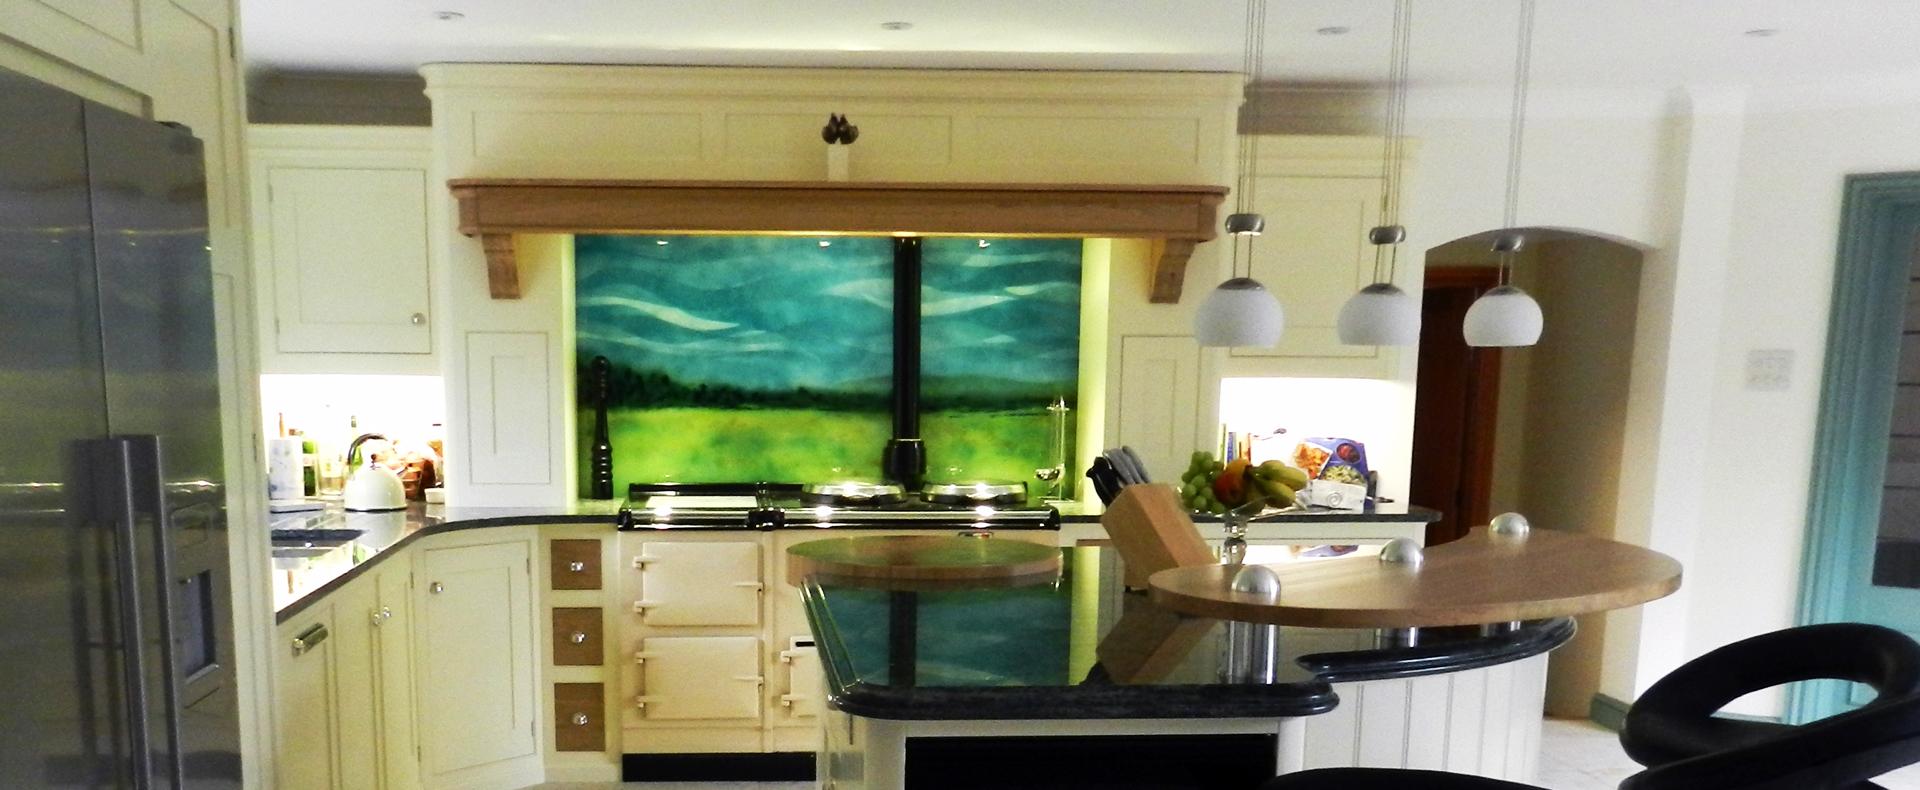 Bespoke commissioned scenic splashback